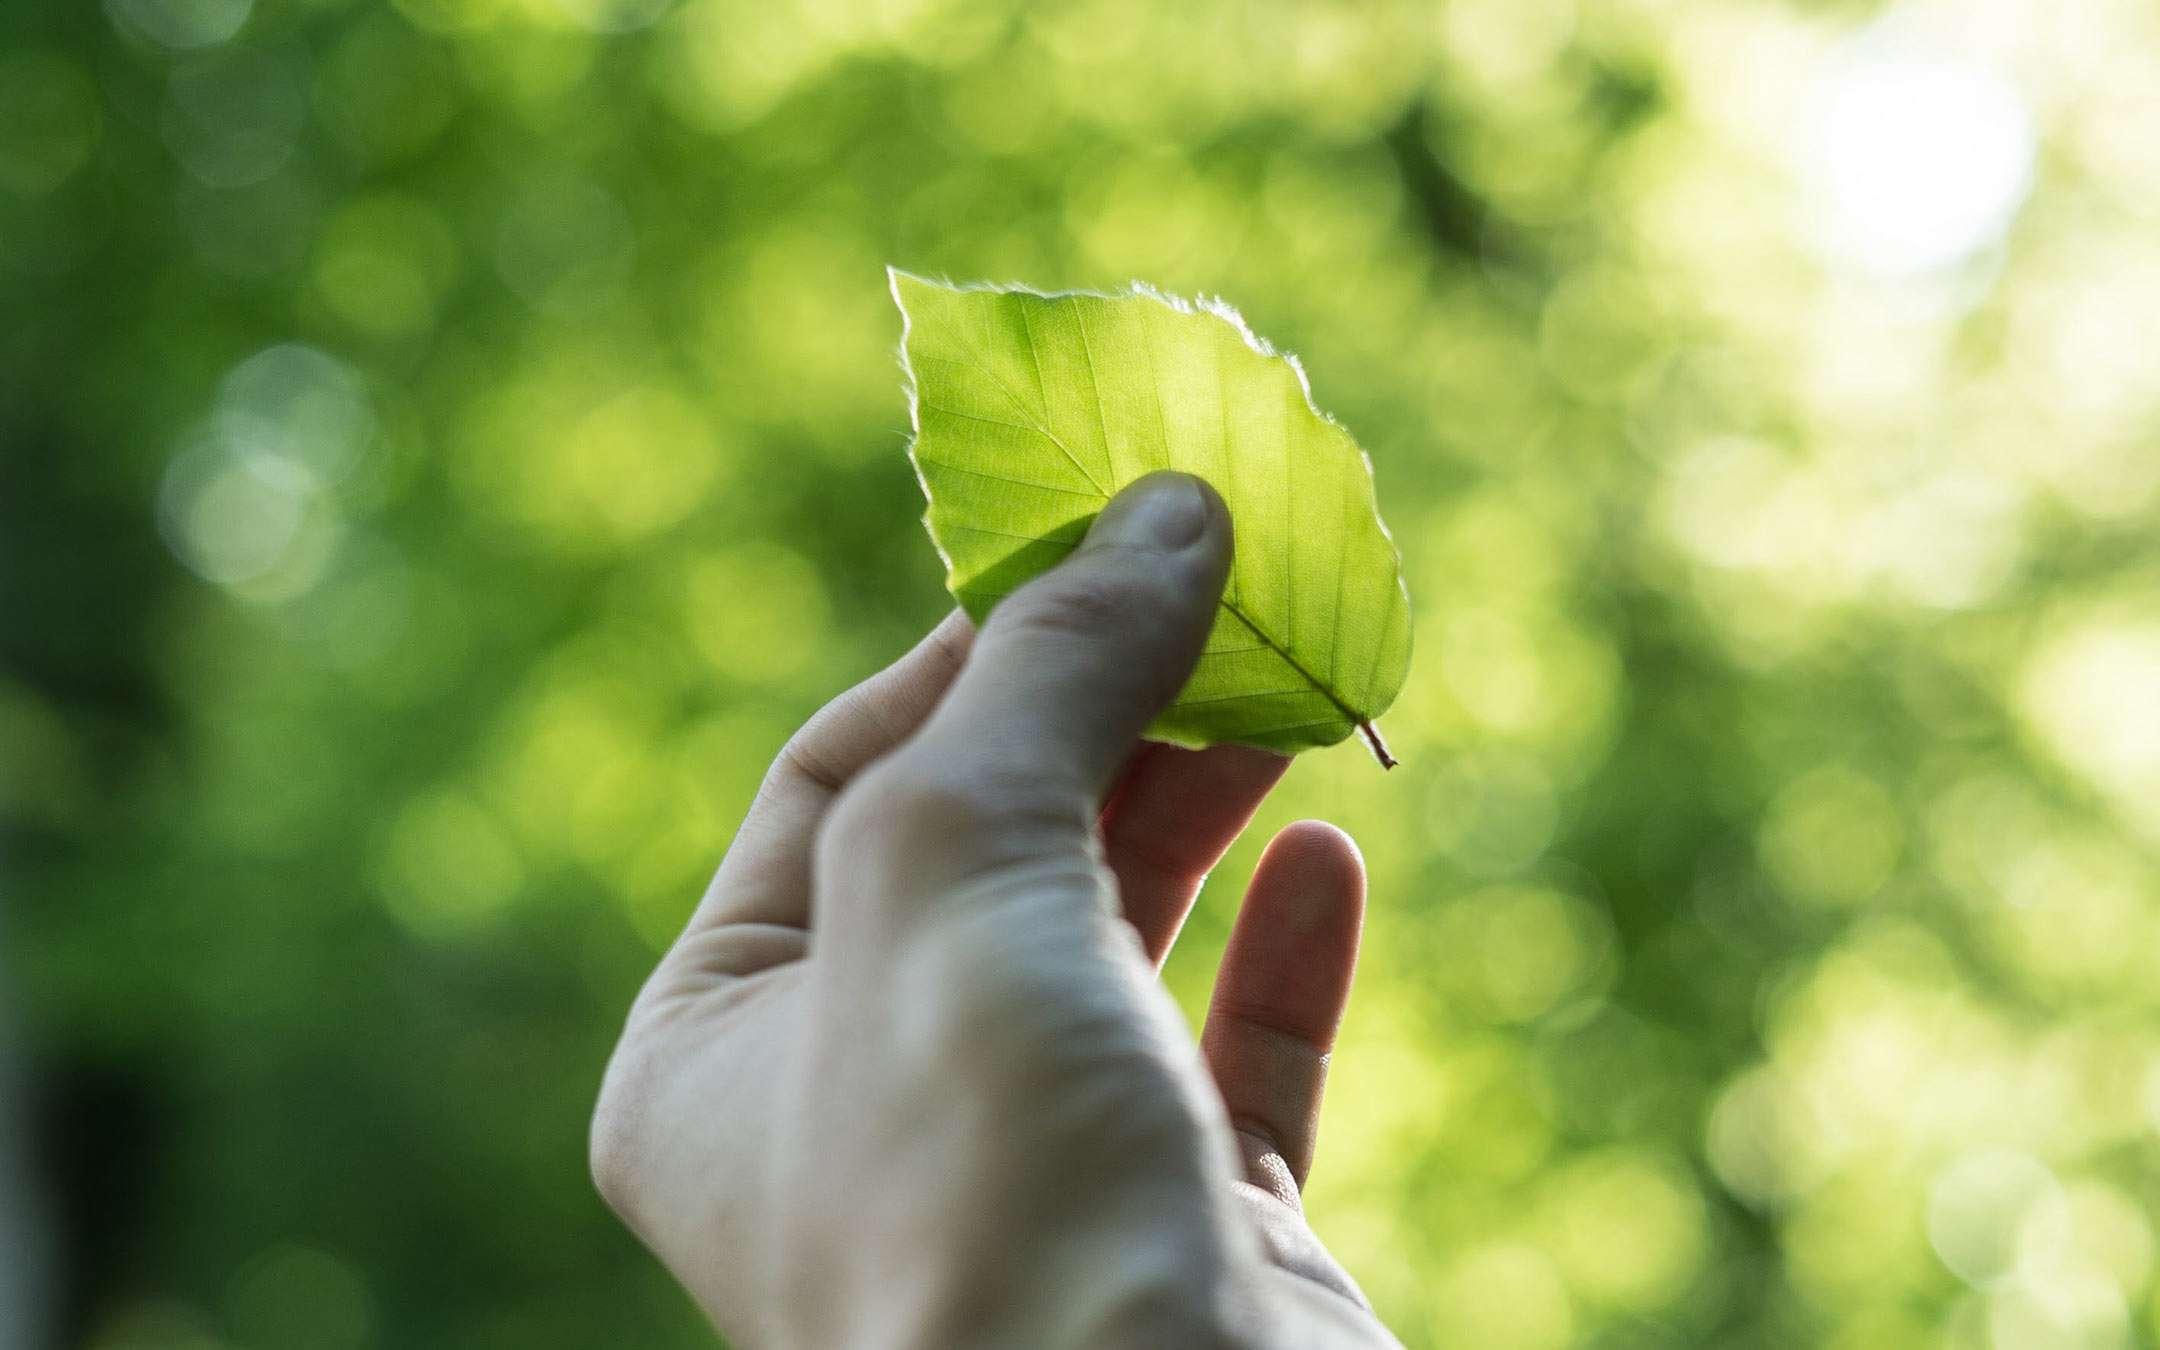 #DigitalRestart: the Alliance for Sustainability